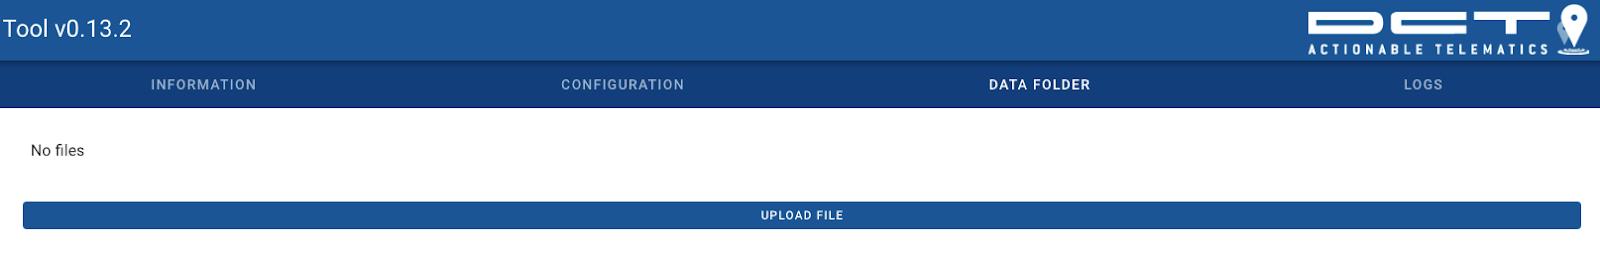 syrus 4 management tool upload file